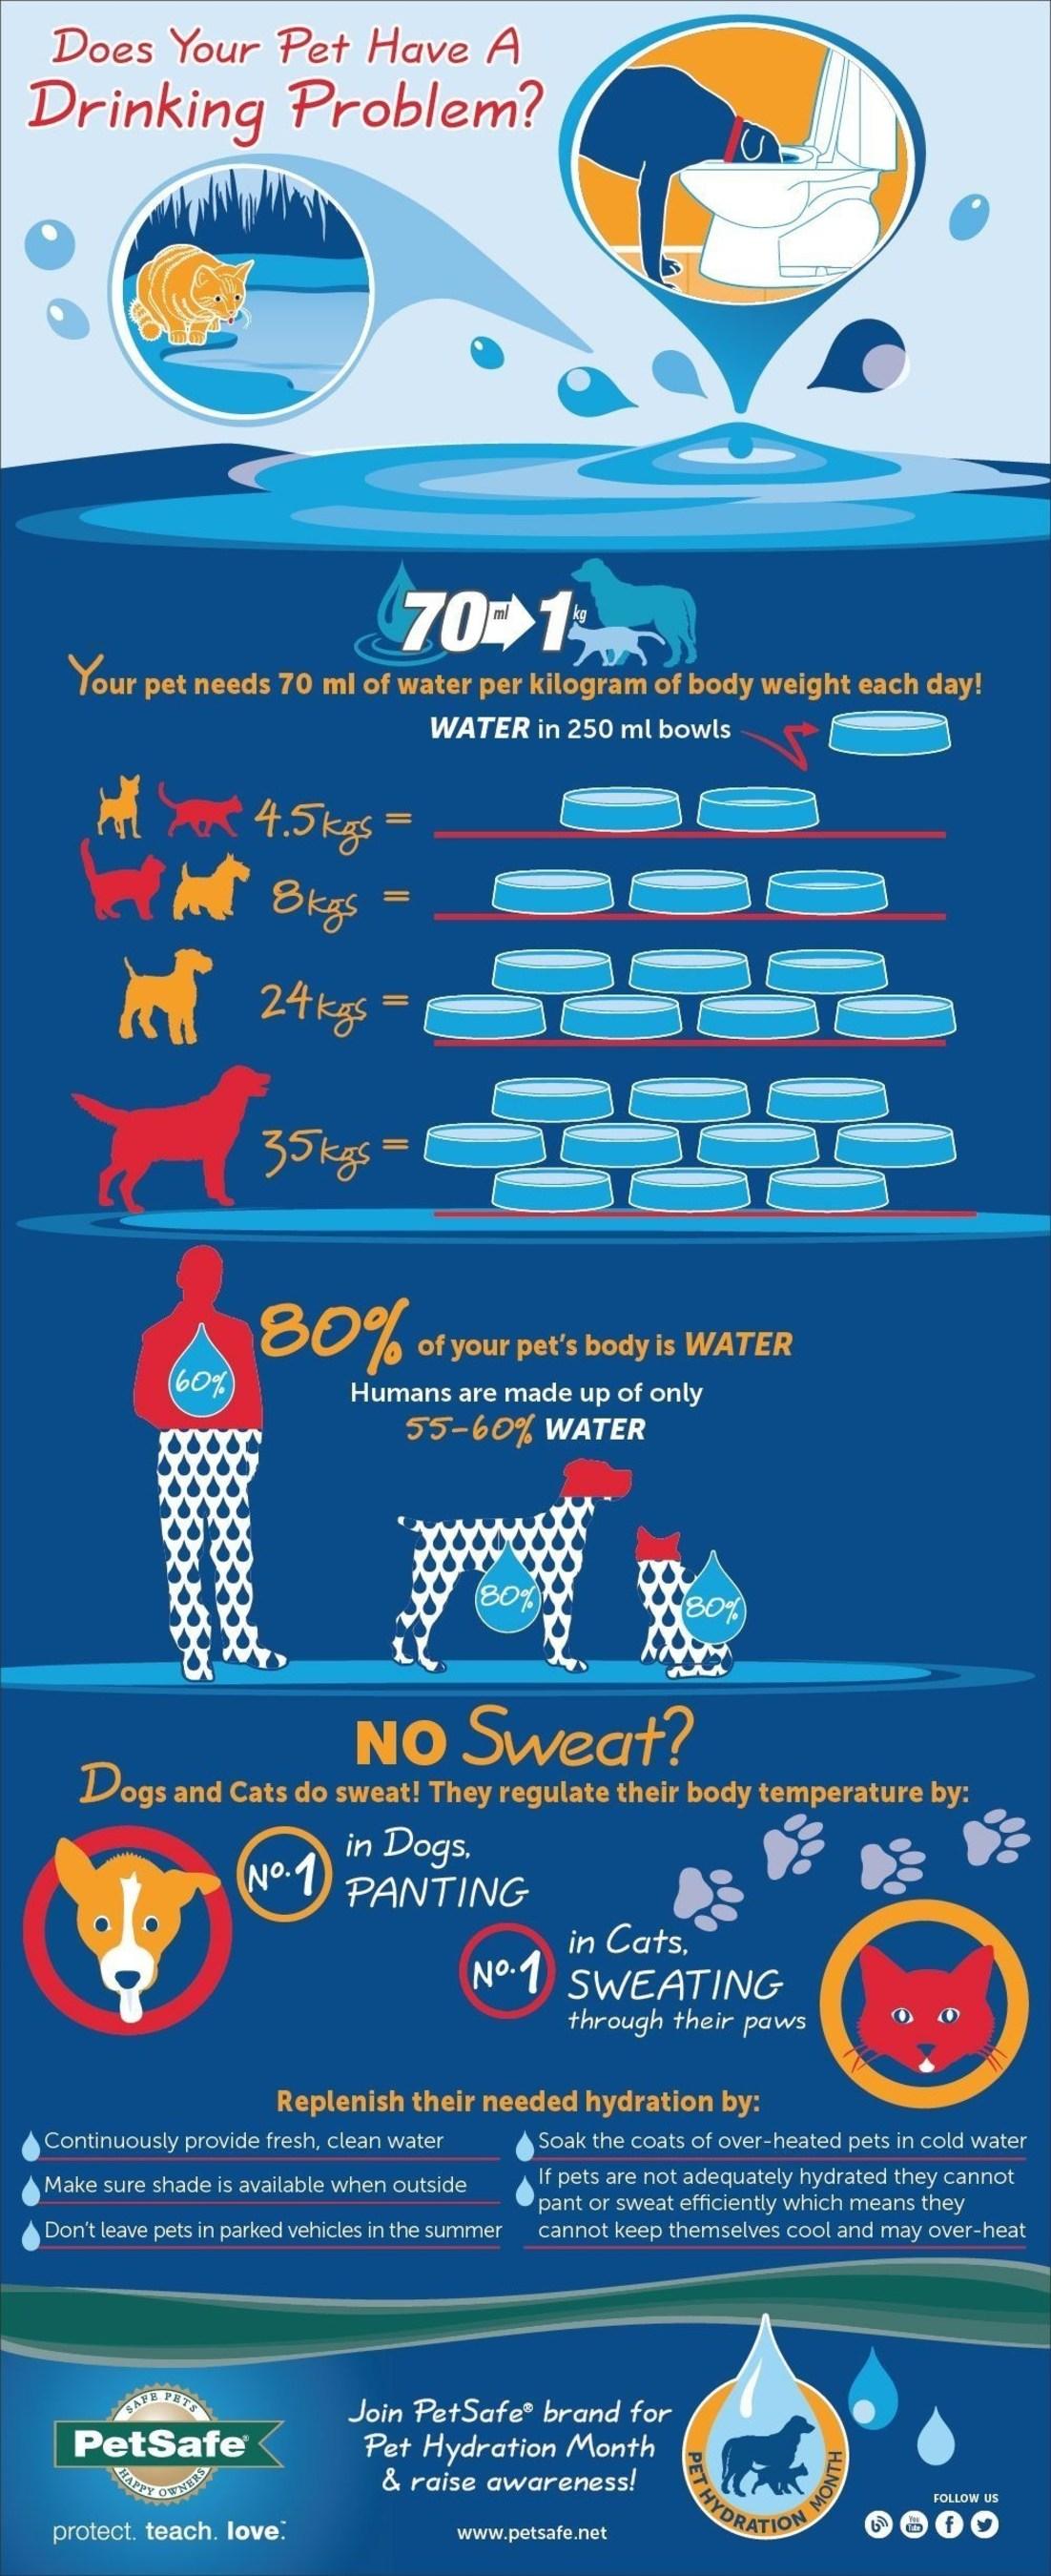 Does Your Pet Have A Drinking Problem? (PRNewsFoto/PetSafe)